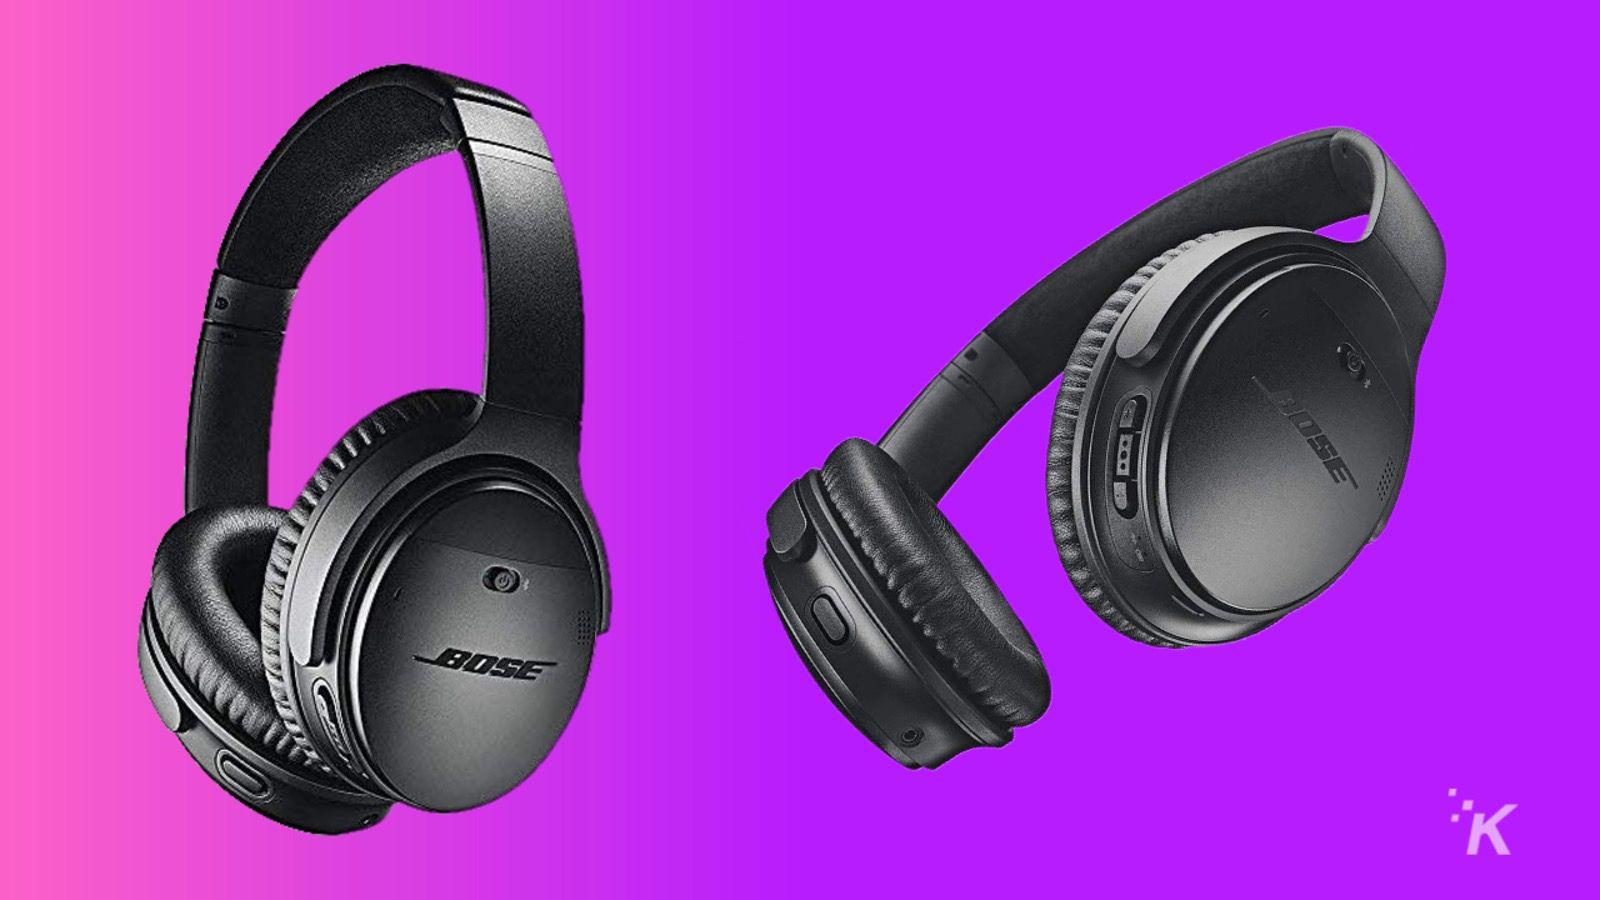 bose quiet comfort bluetooth headphones